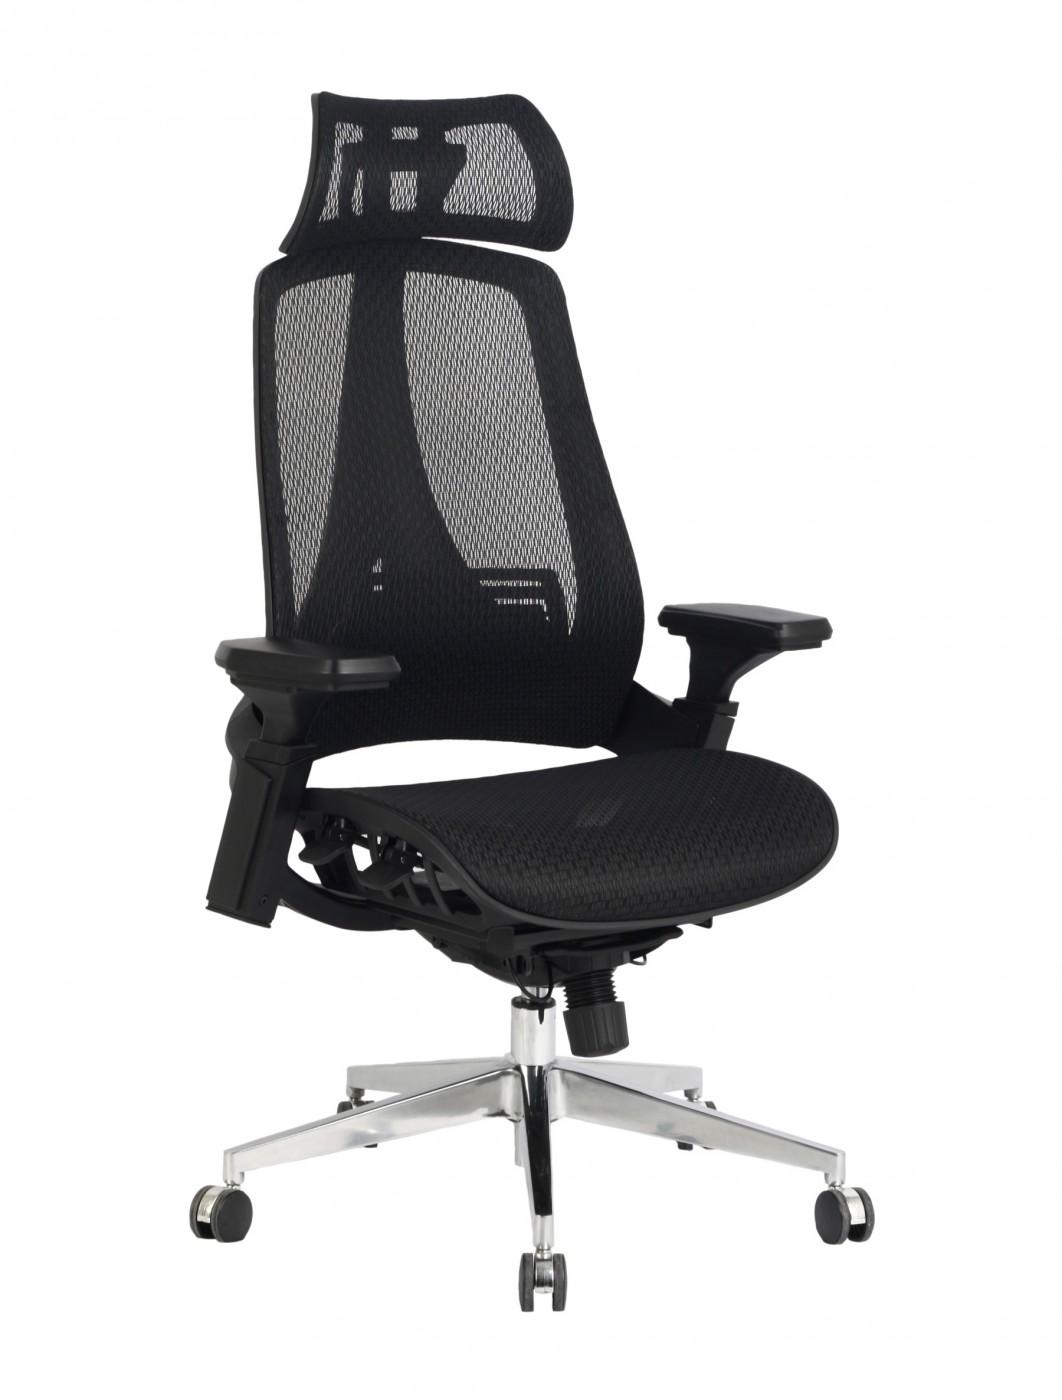 posture gaming chair walmart evenflo high dams sorrento mesh back sor300k2 k 121